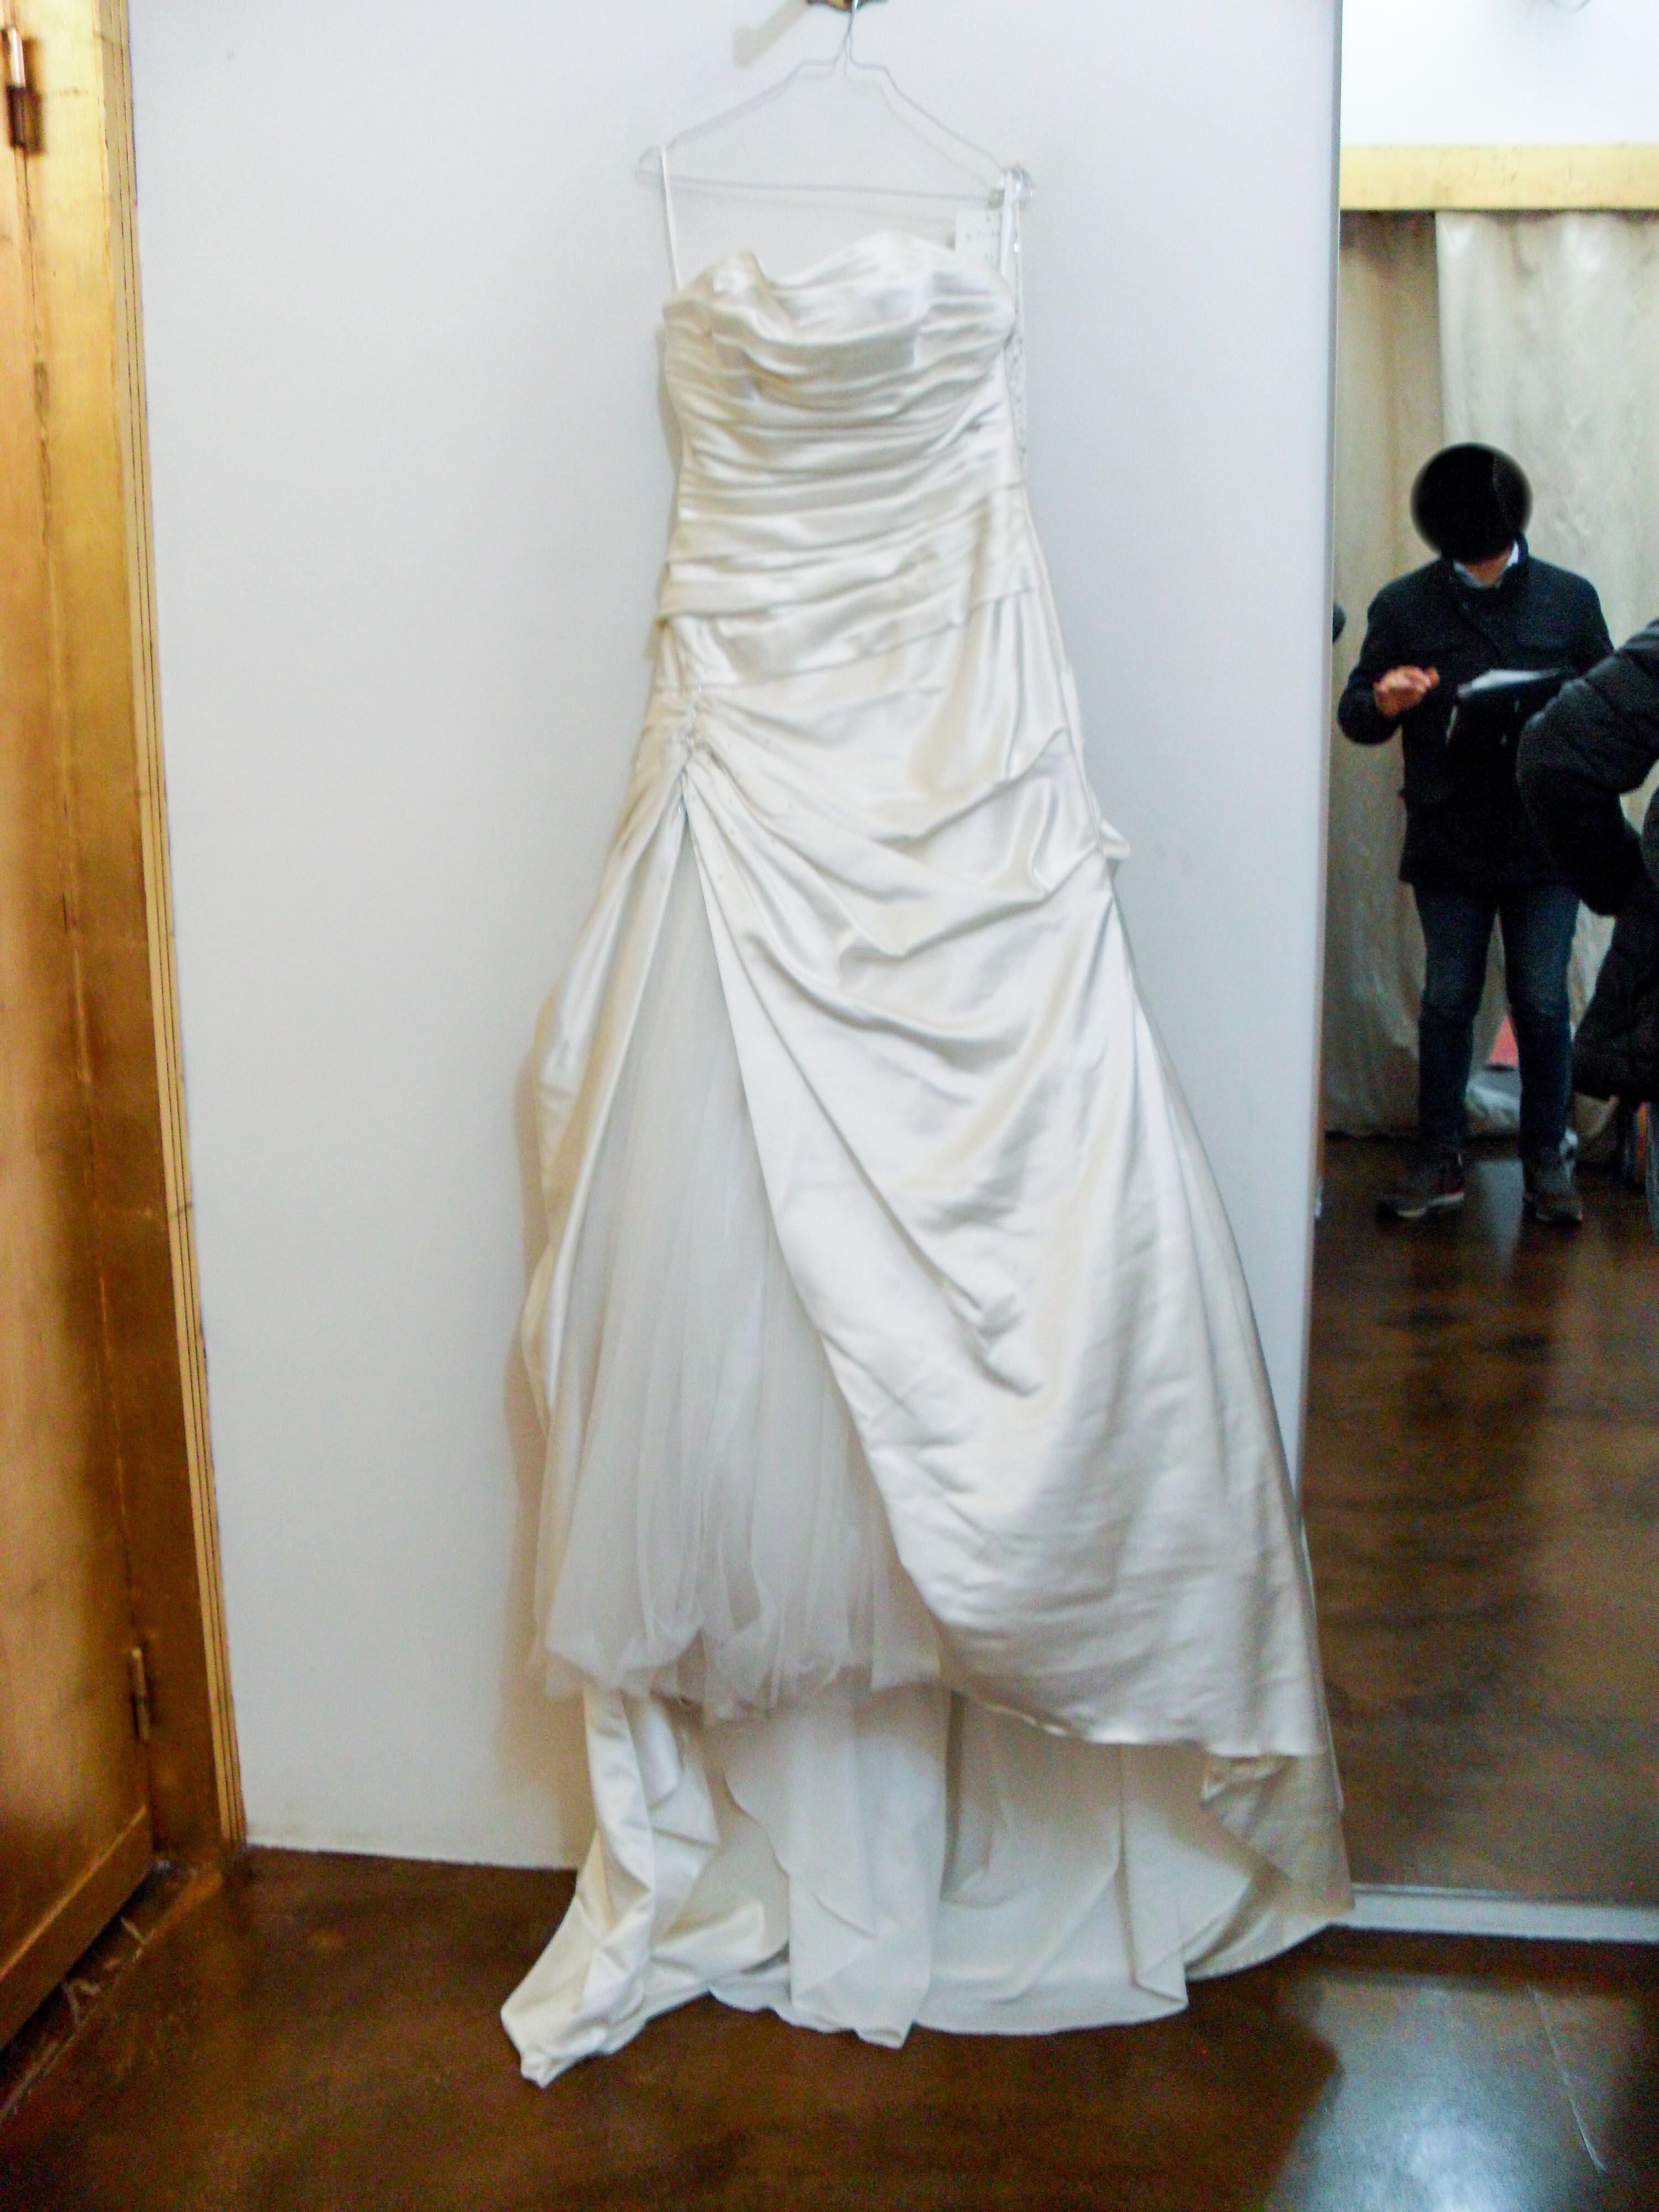 187beac6d2f1 N.1 Abito da sposa marca Nana couture taglia 42 - Astemobili.it